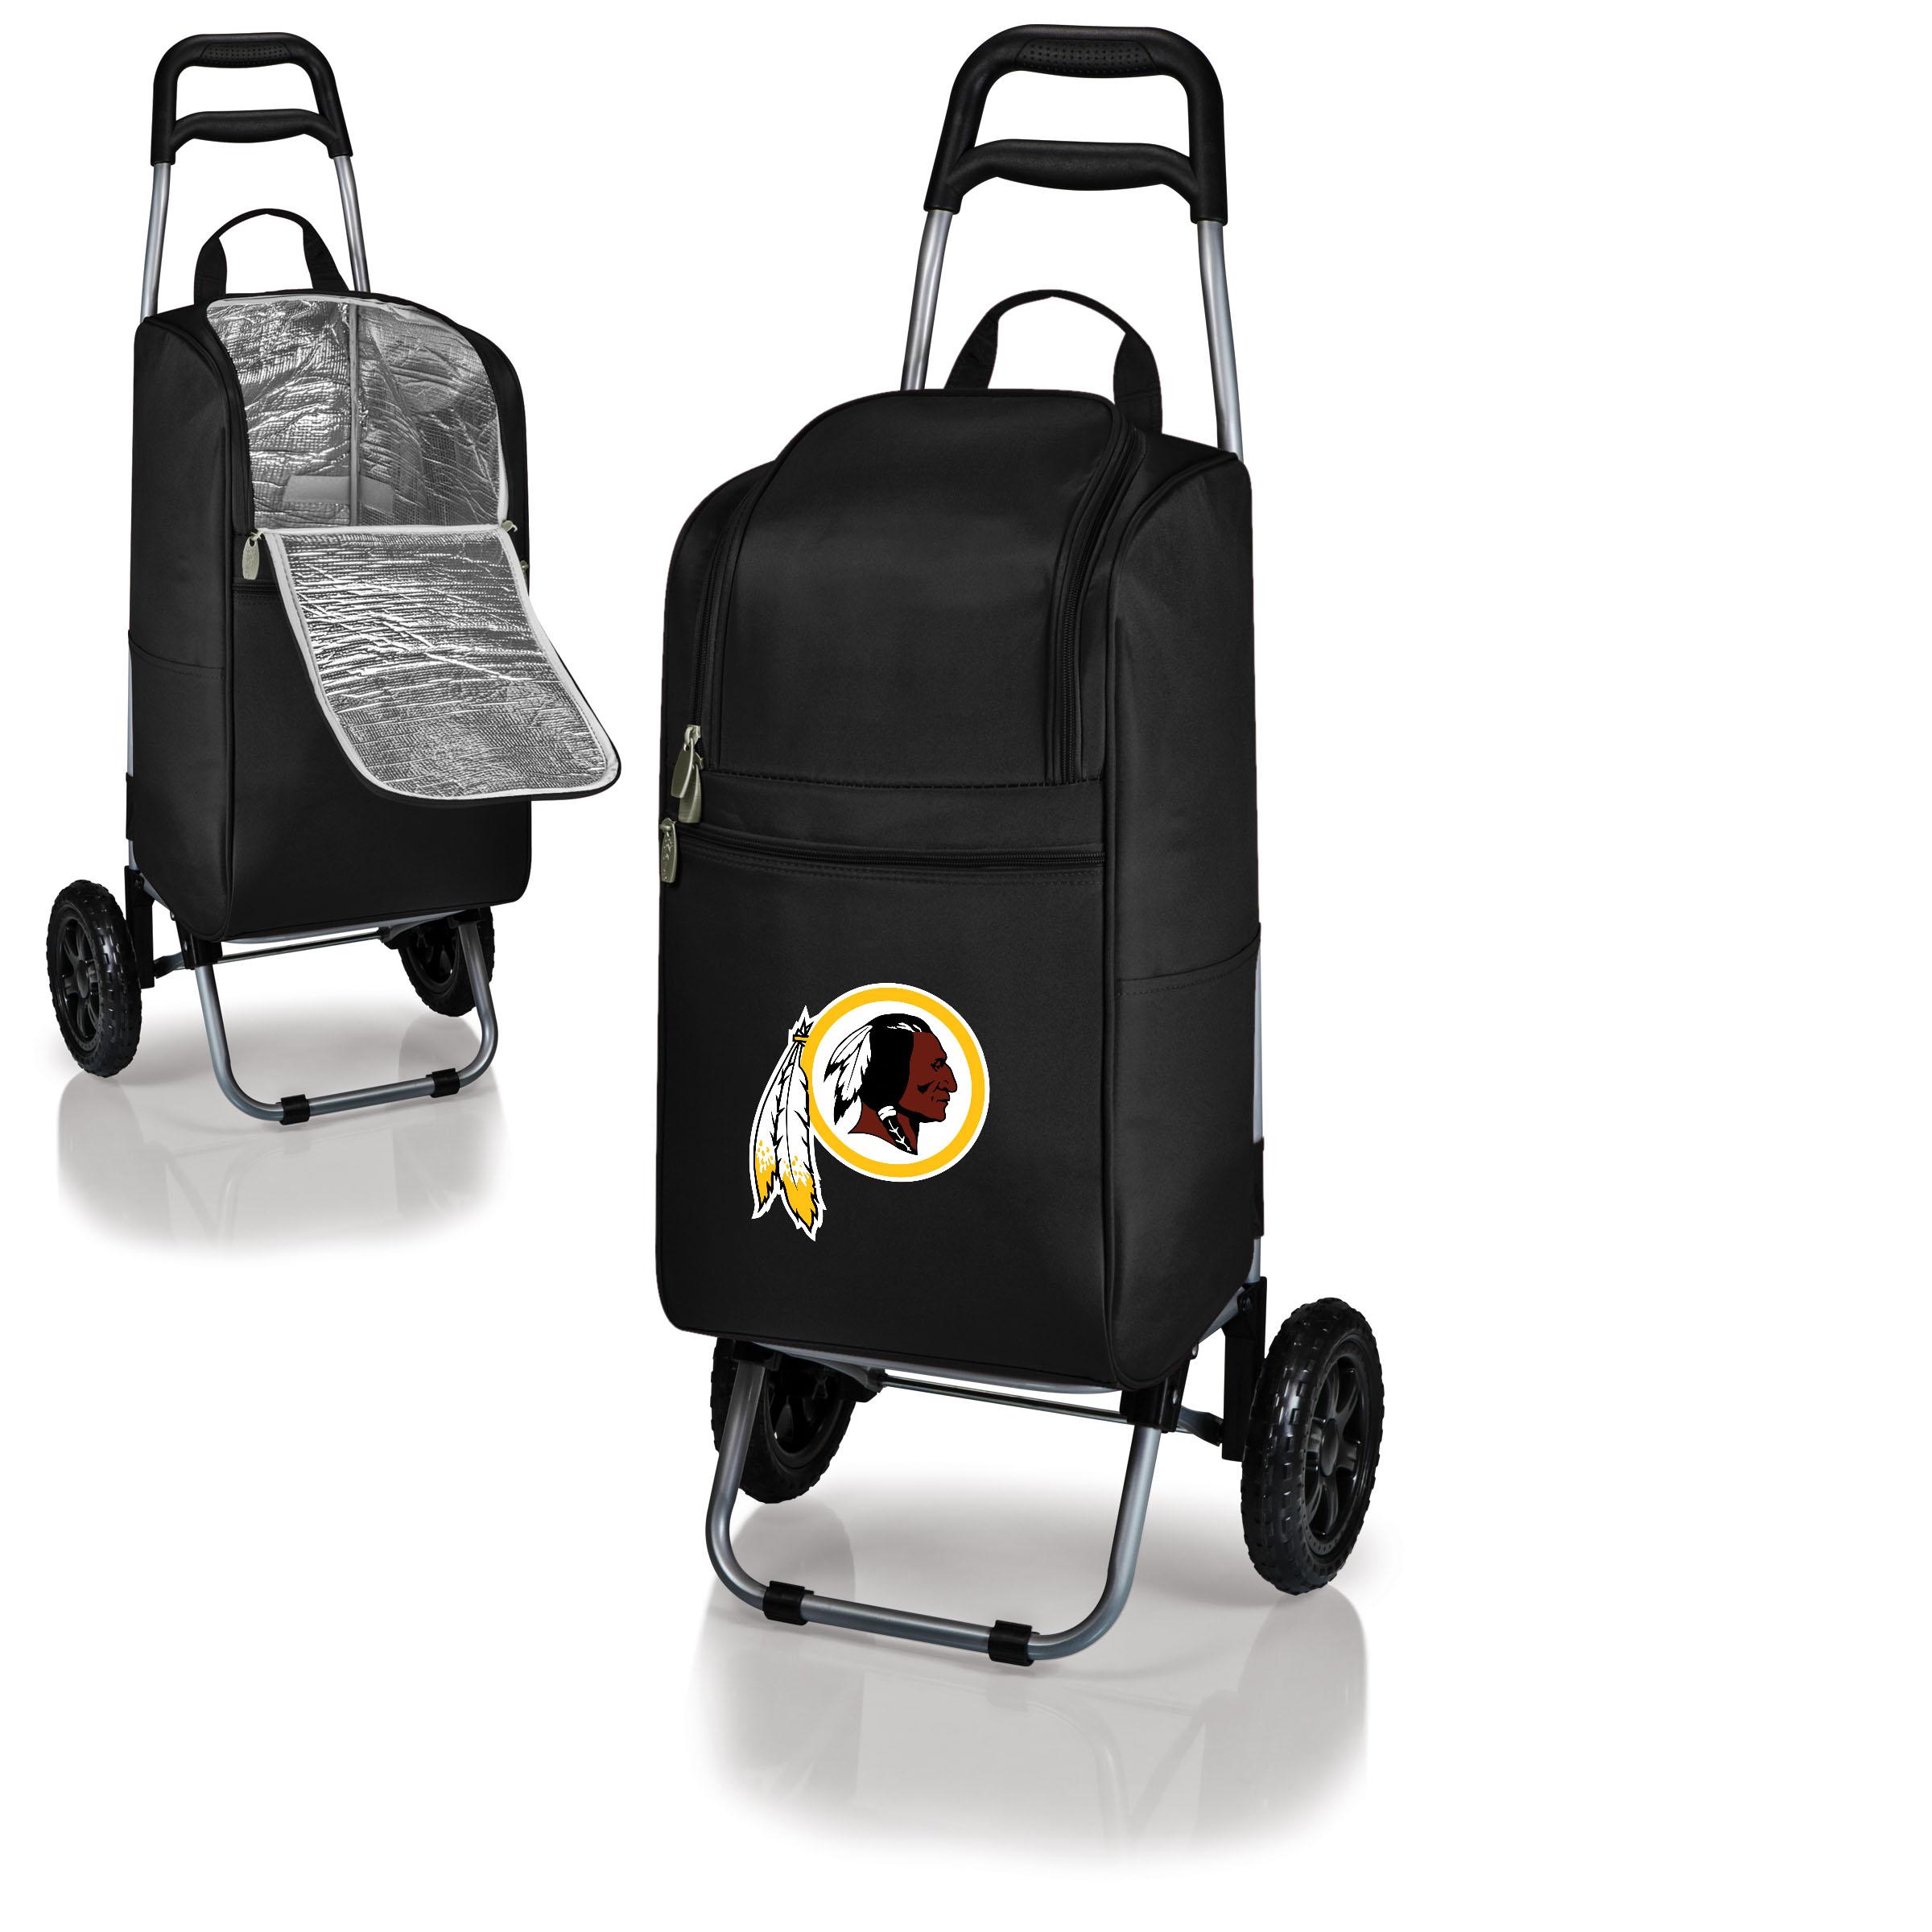 Washington Redskins Cart Cooler - Black - No Size